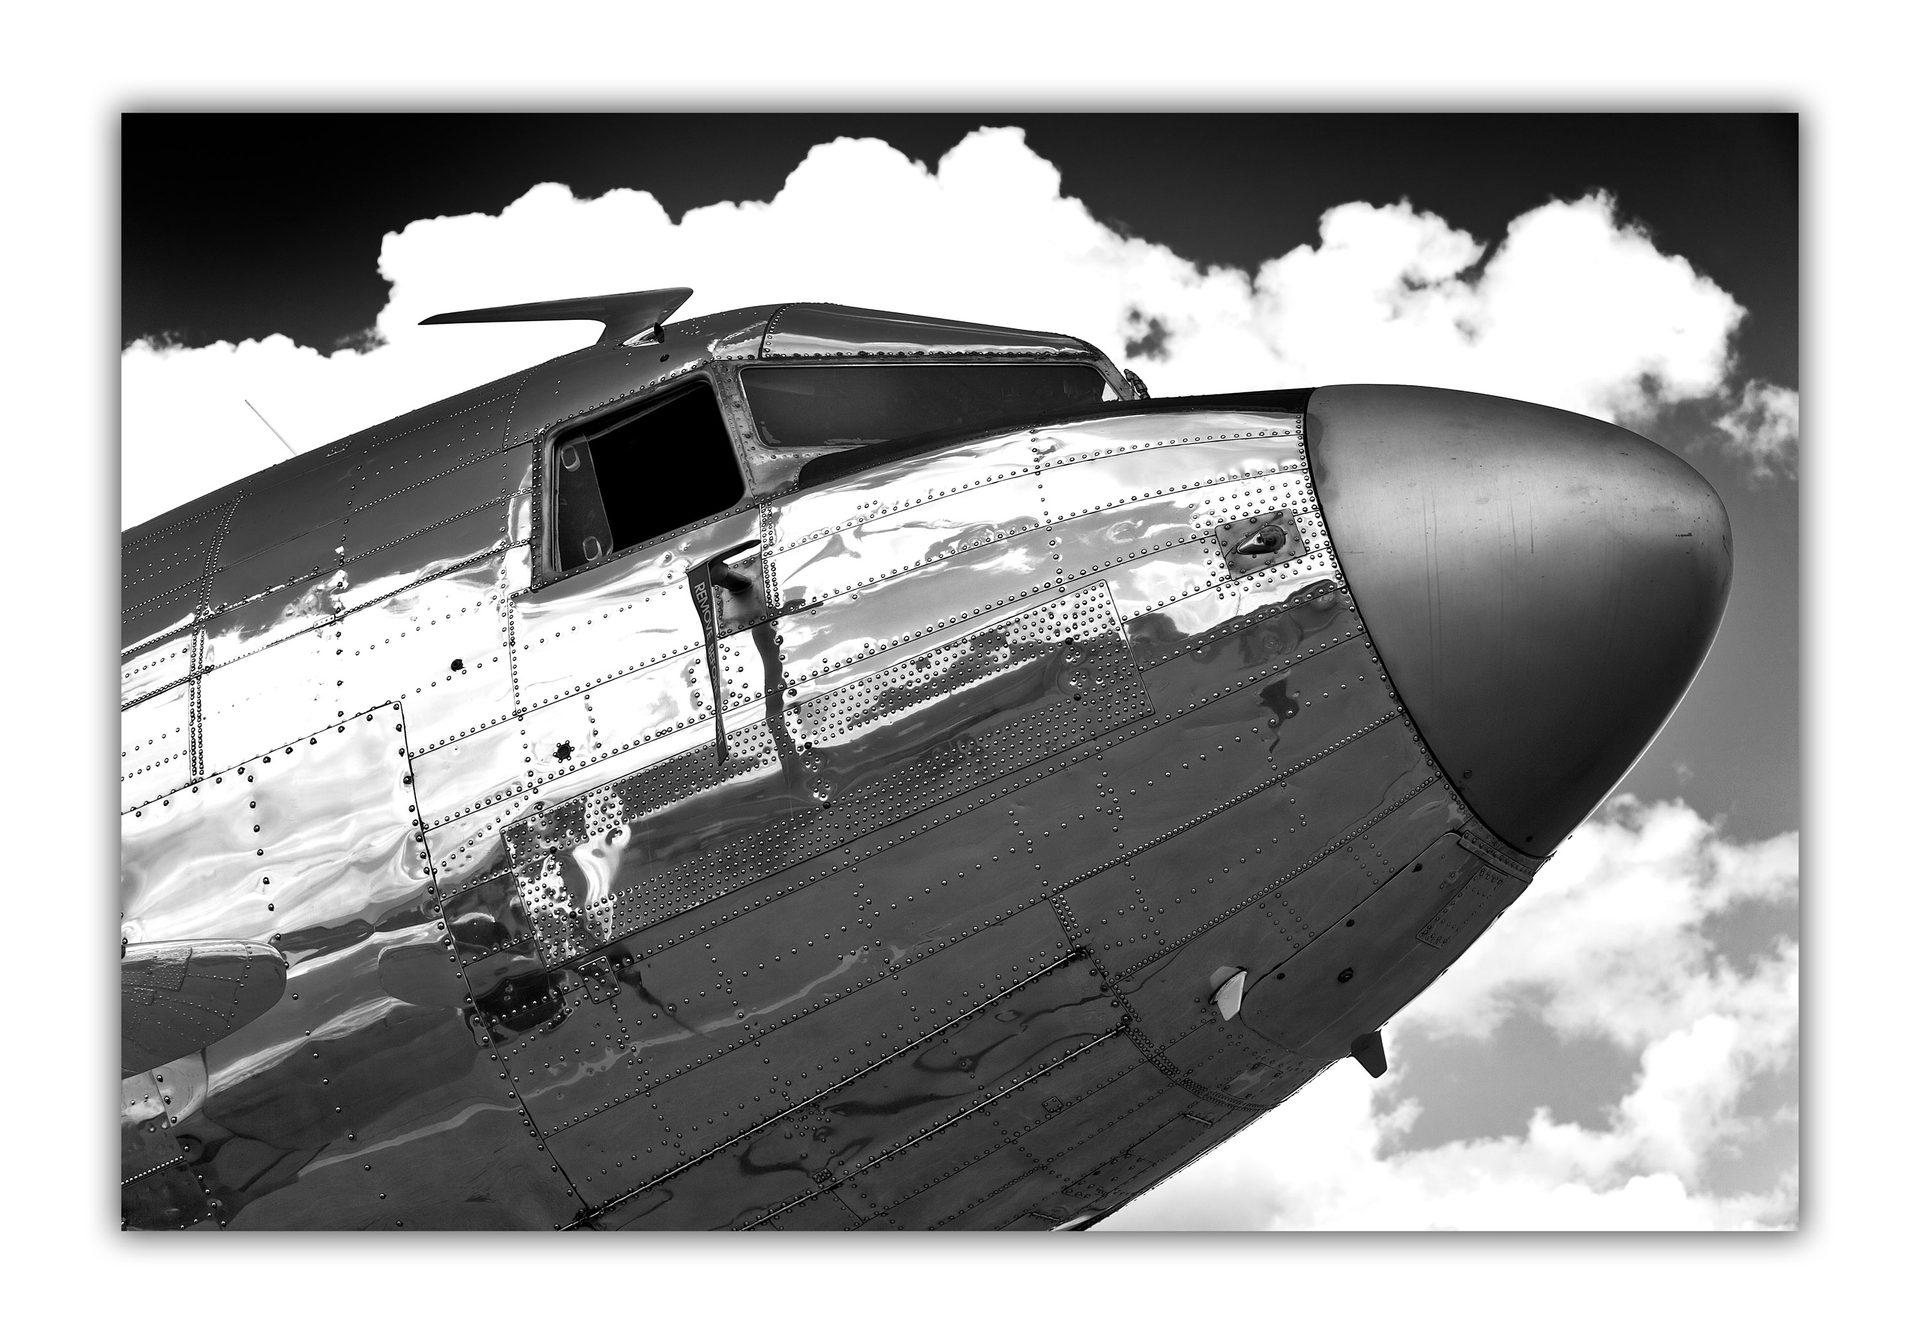 Remove before Flight (Tyson V. RININGER)